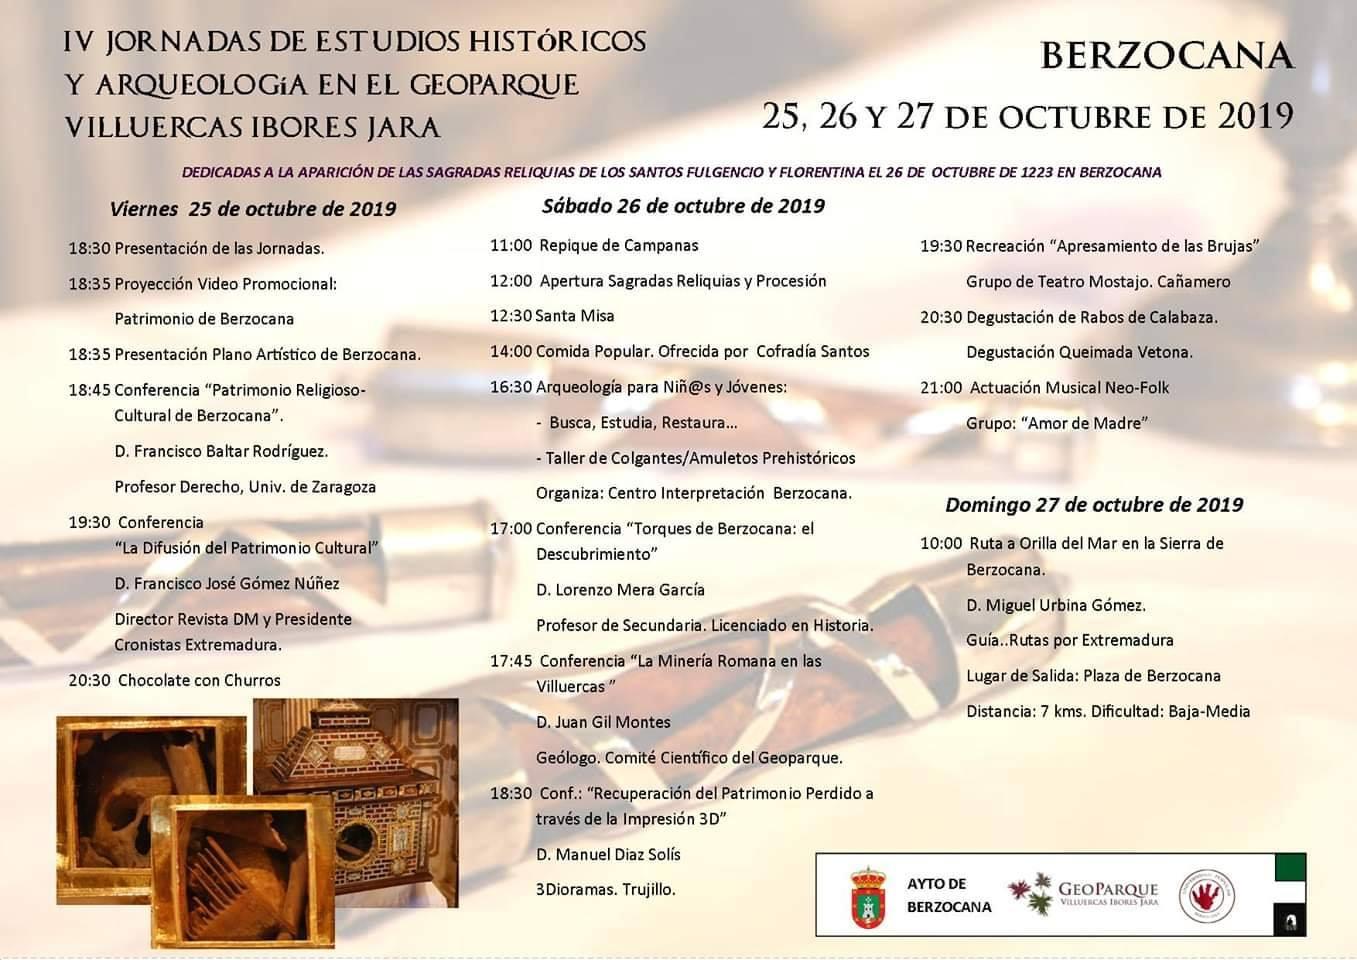 IV Jornadas de estudios históricos y arqueología - Berzocana (Cáceres)